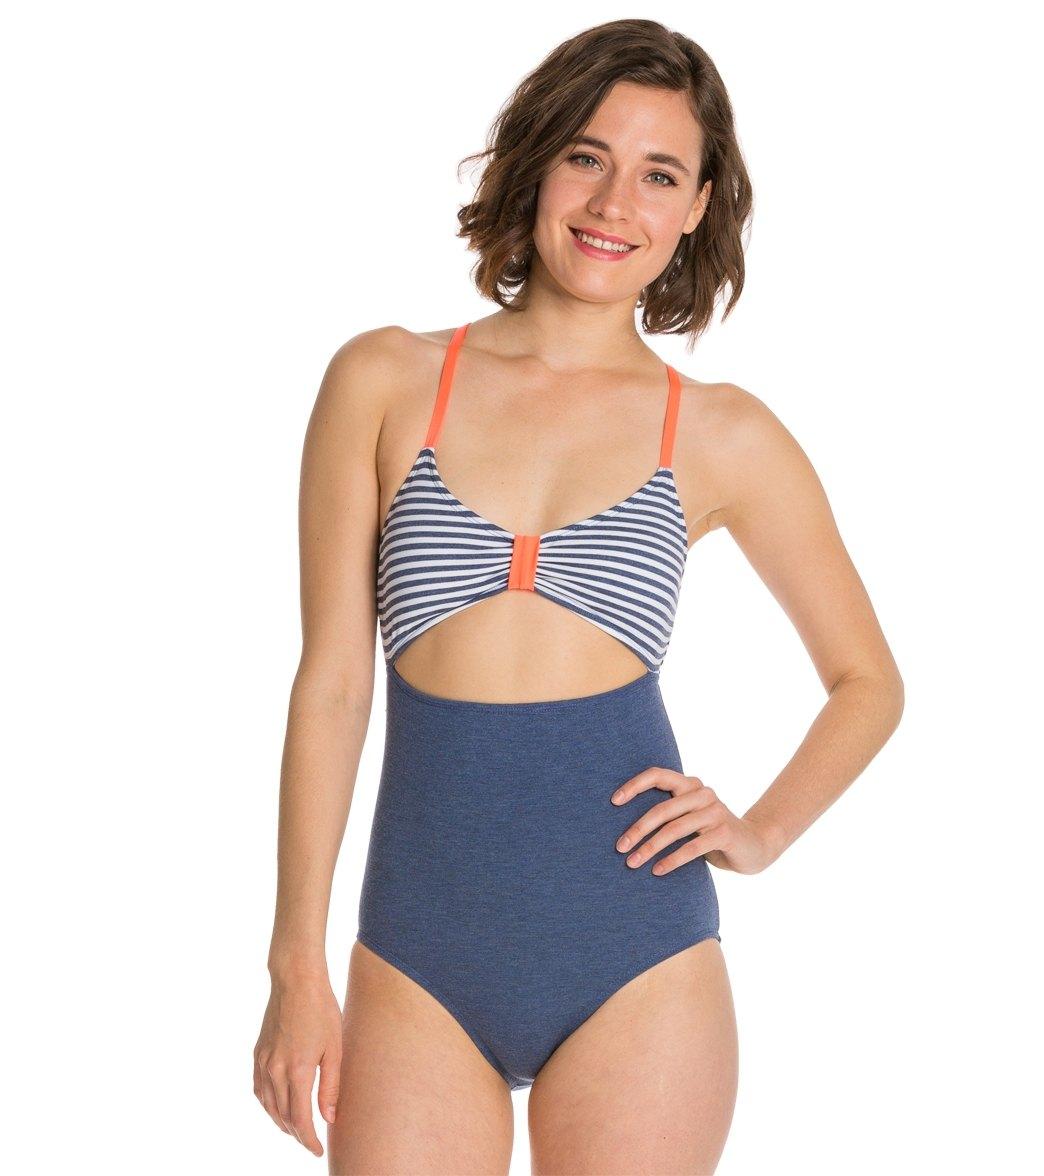 42b051e2a6d7b Splendid Sporty Blues Peek A Boo One Piece Swimsuit at SwimOutlet ...